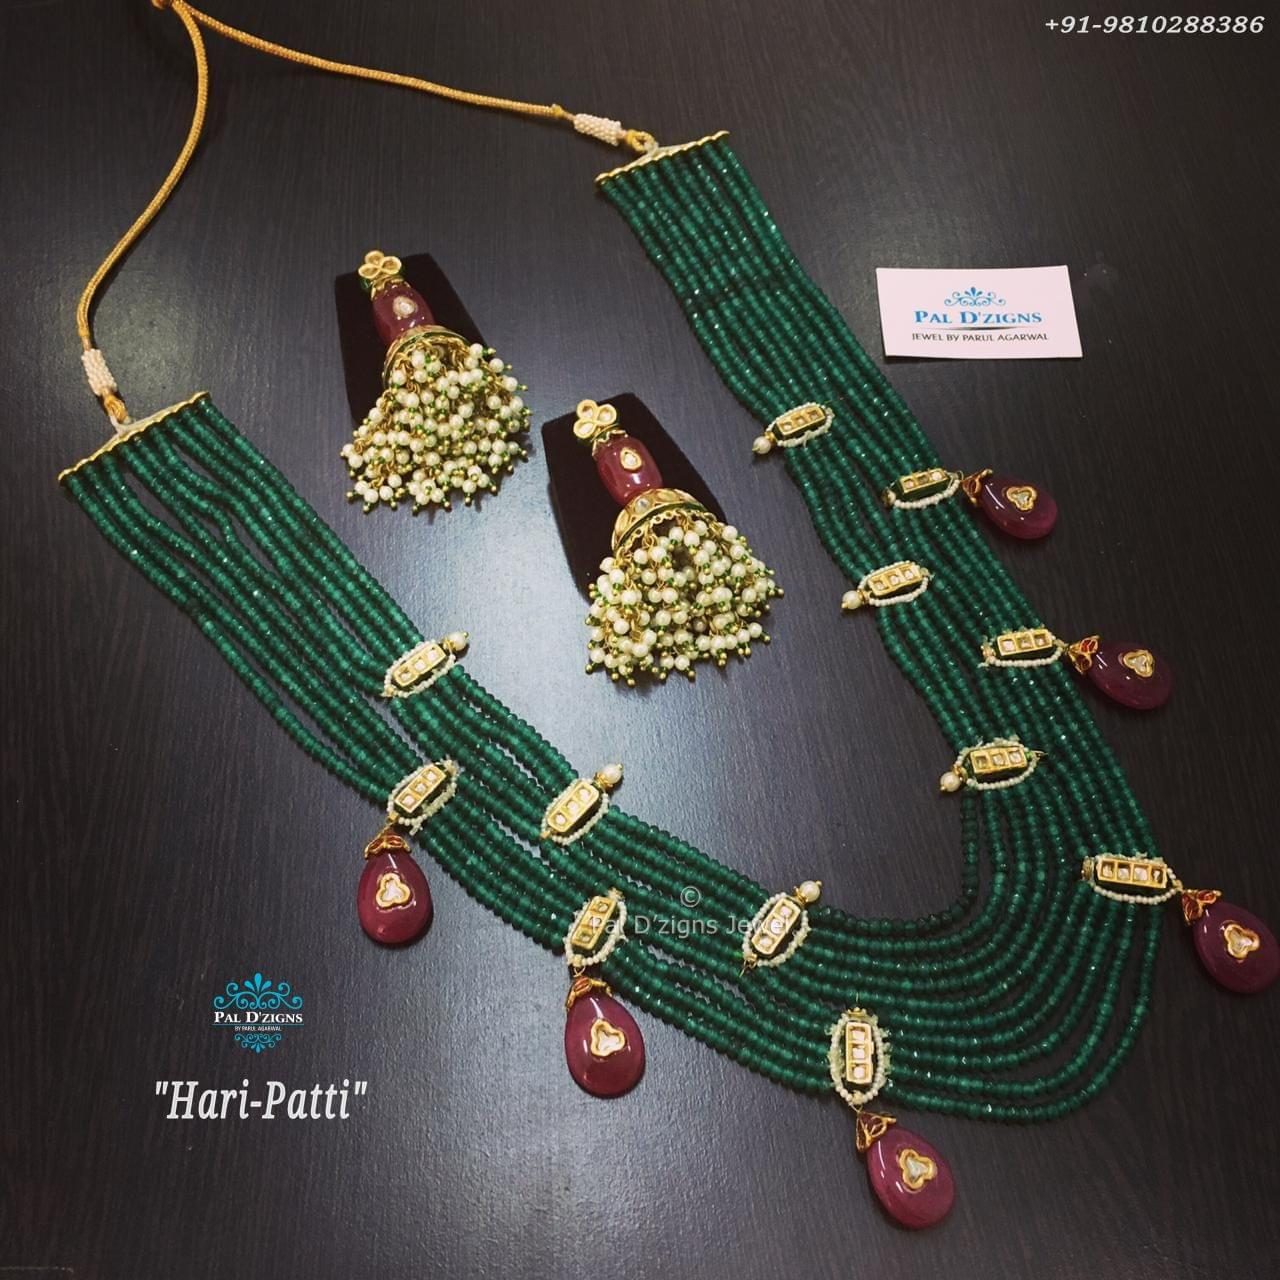 Hari - Patti Necklace Set